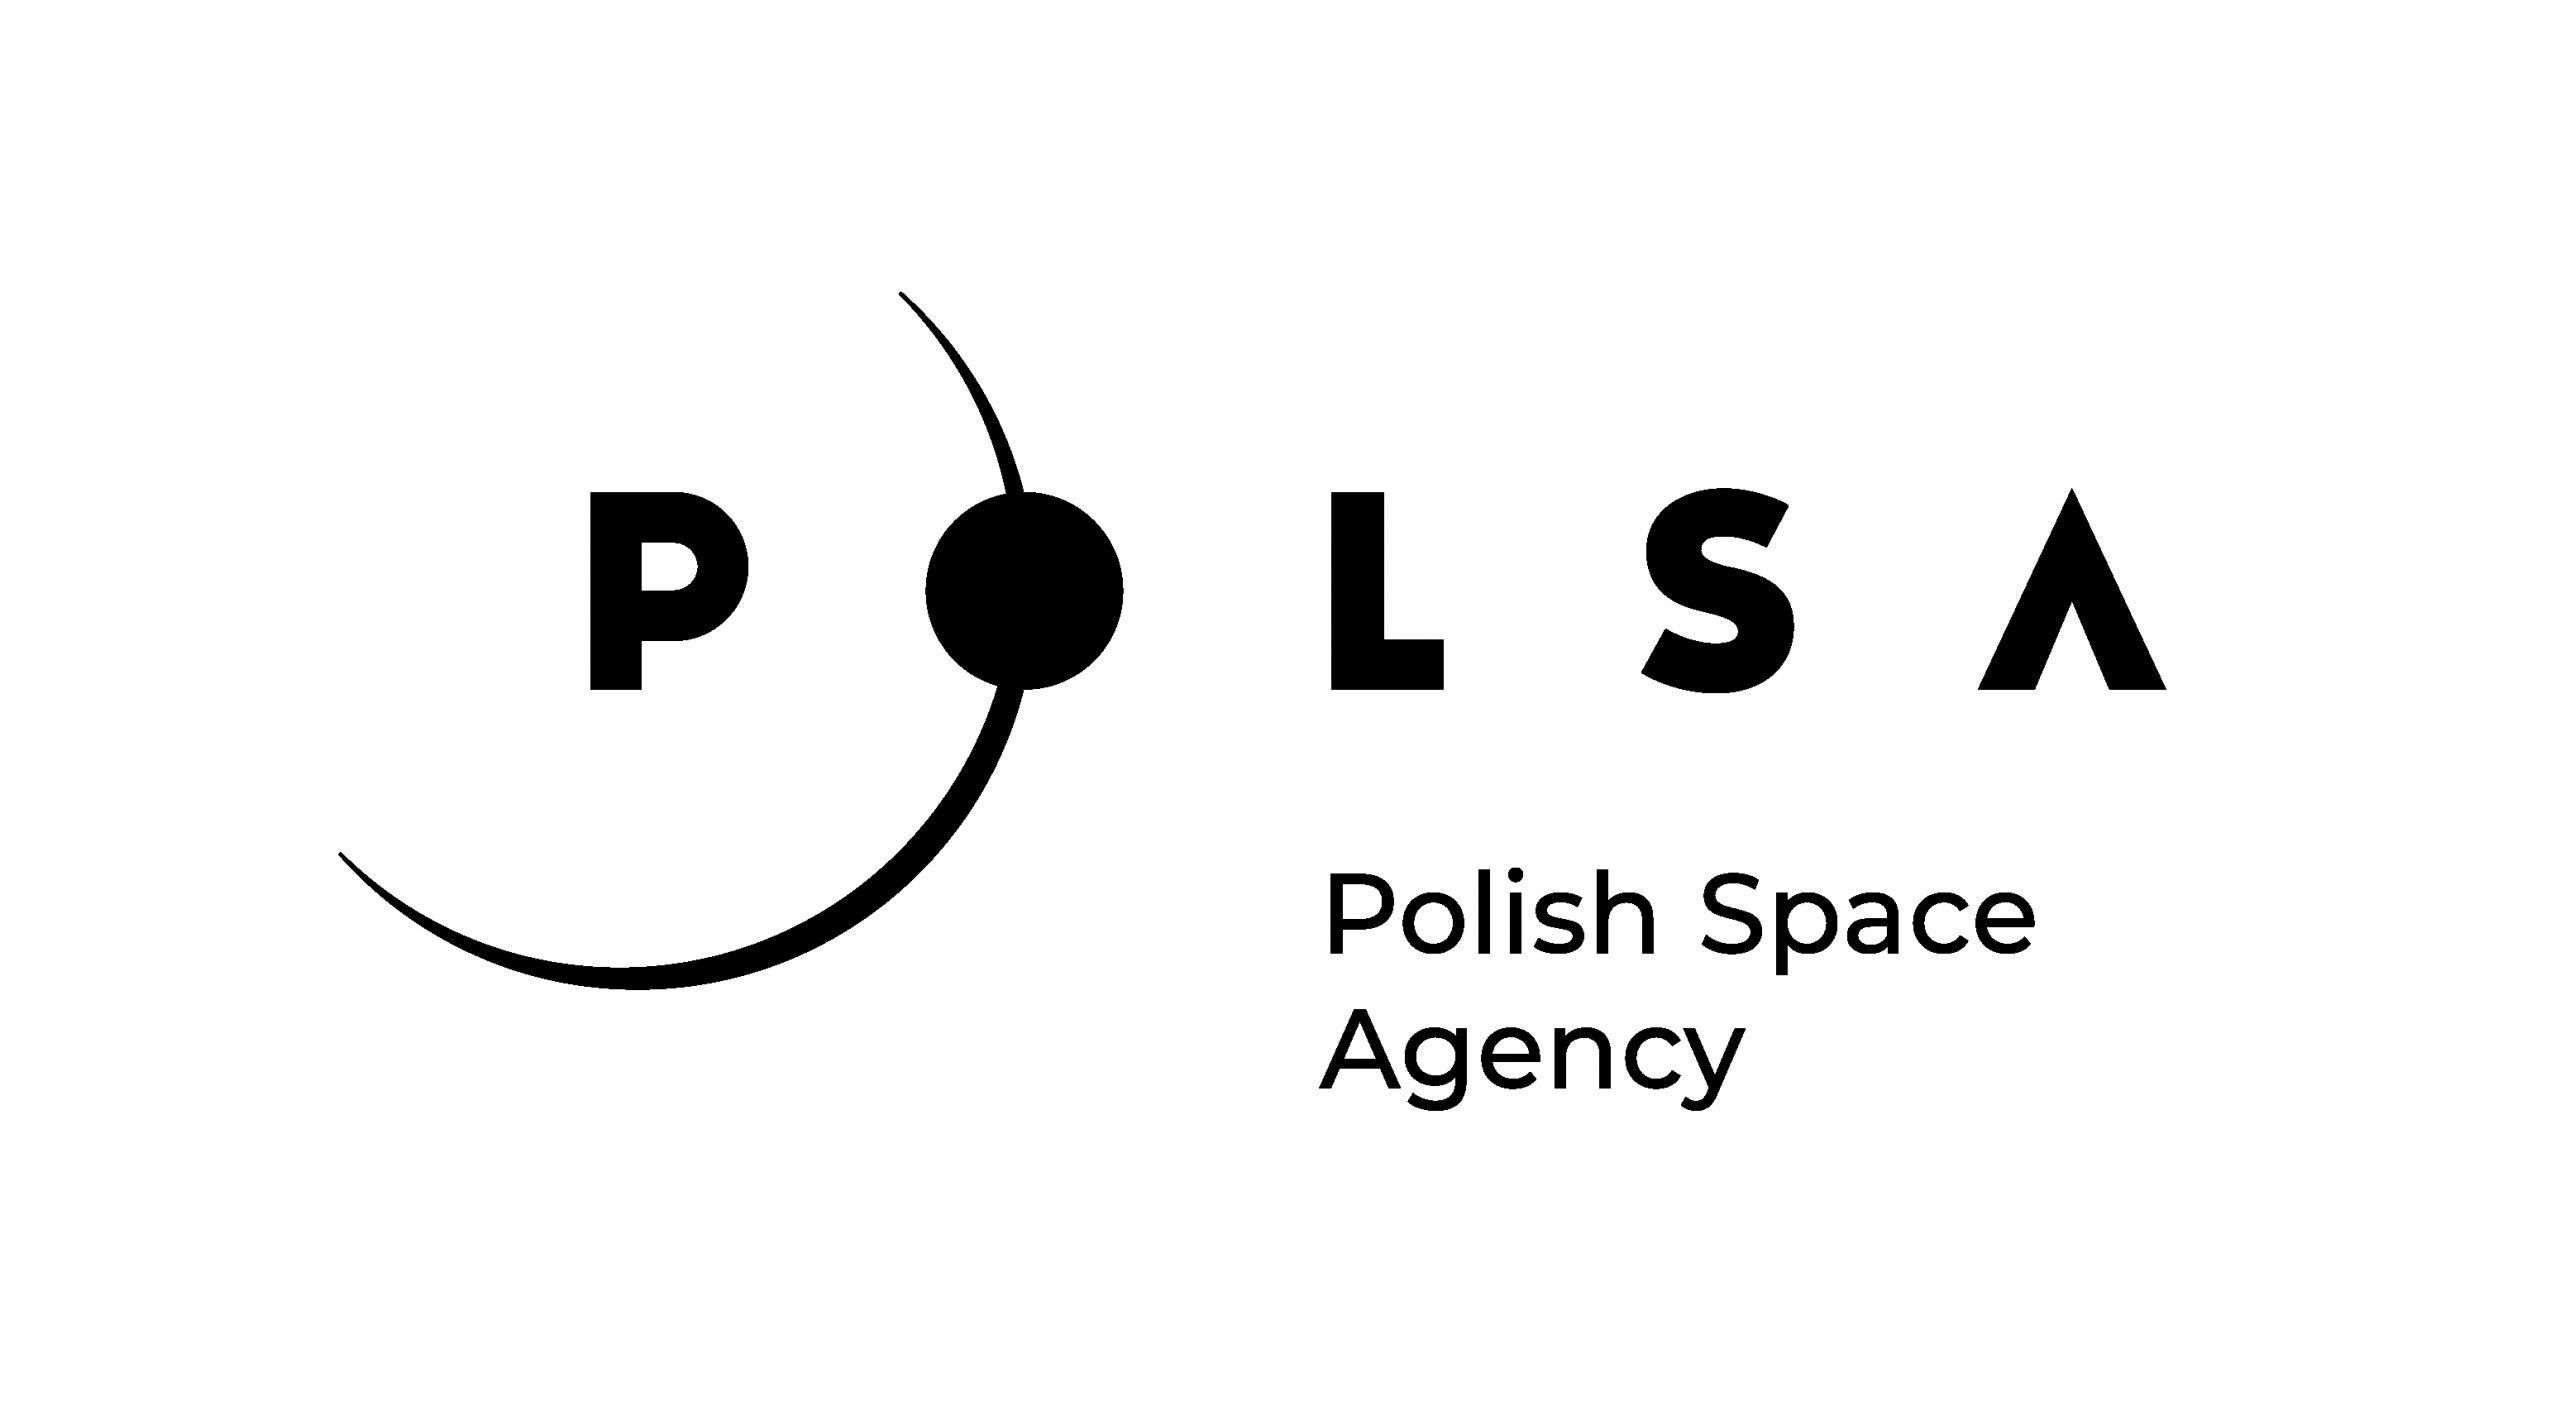 Polish Space Agency